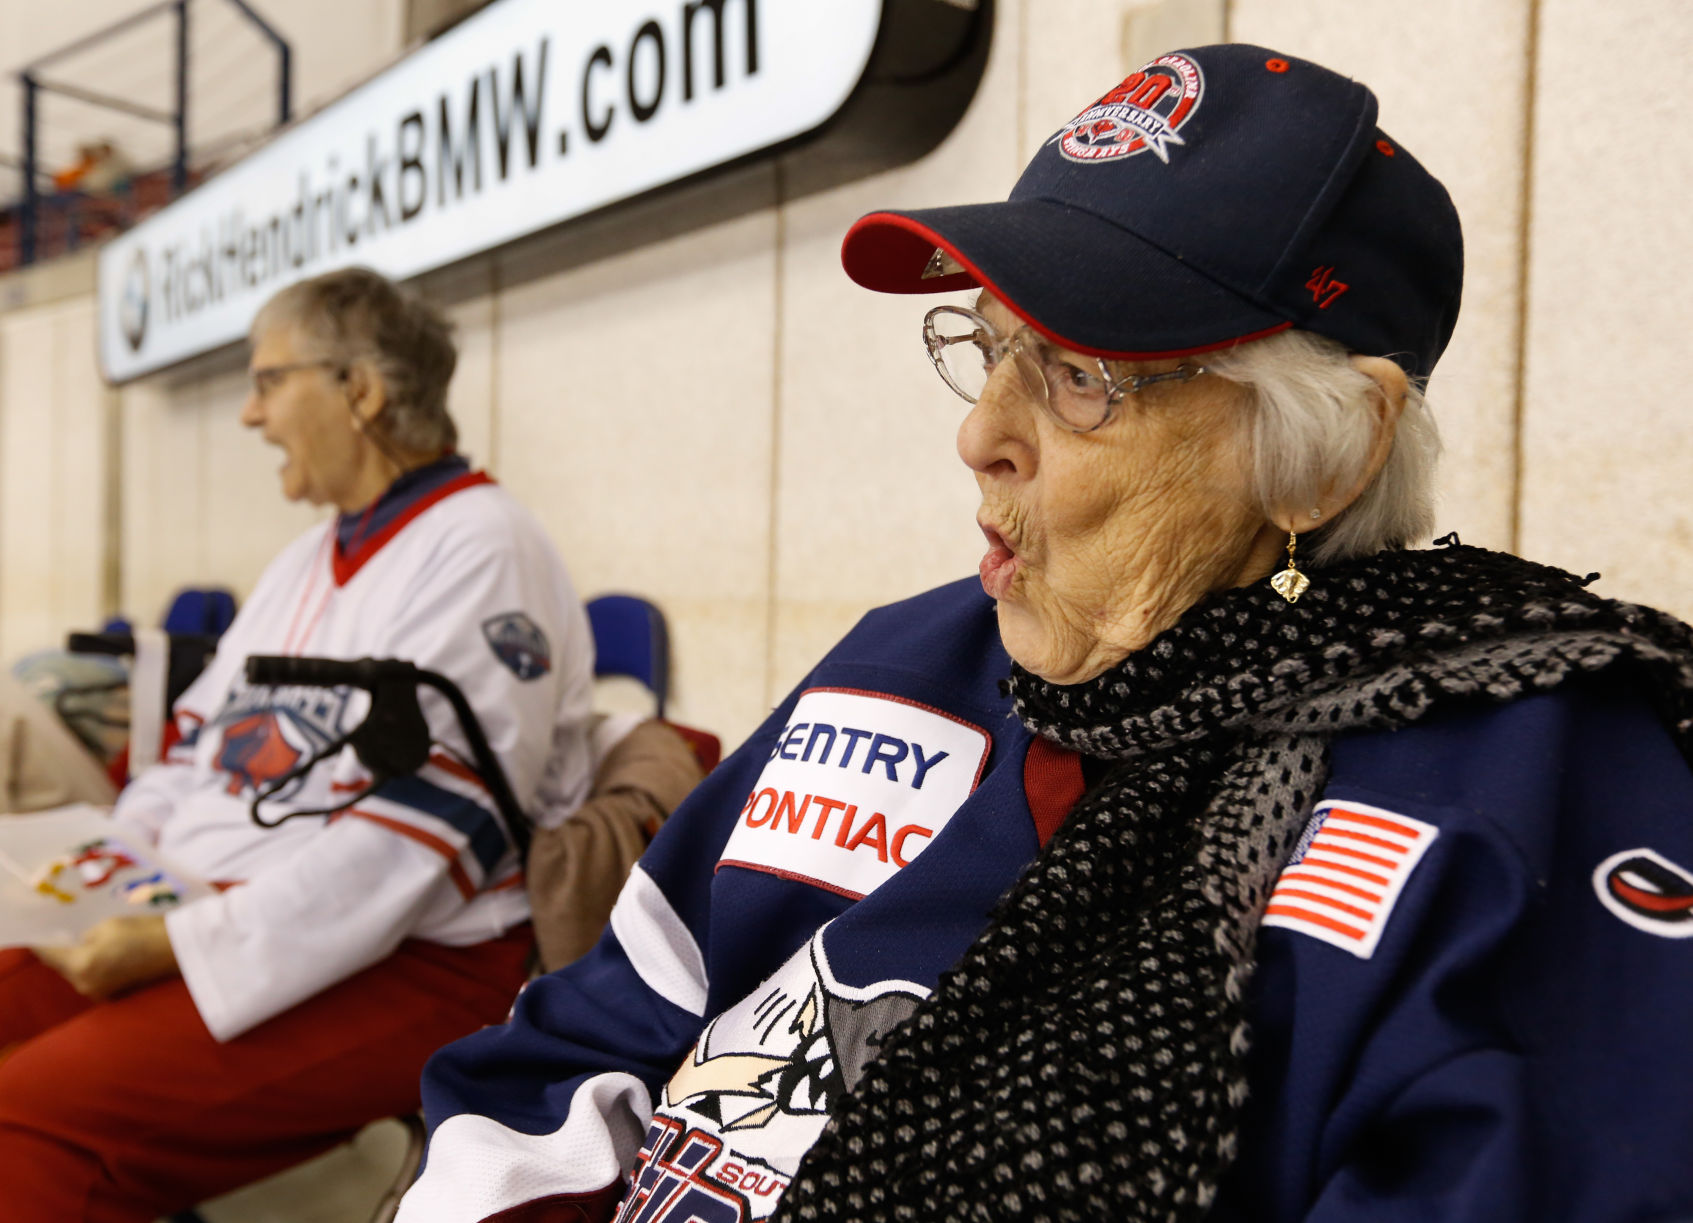 ECHL: At 96, Eleanor Ann Spradlin Is Still A Stingrays Super Fan (video)